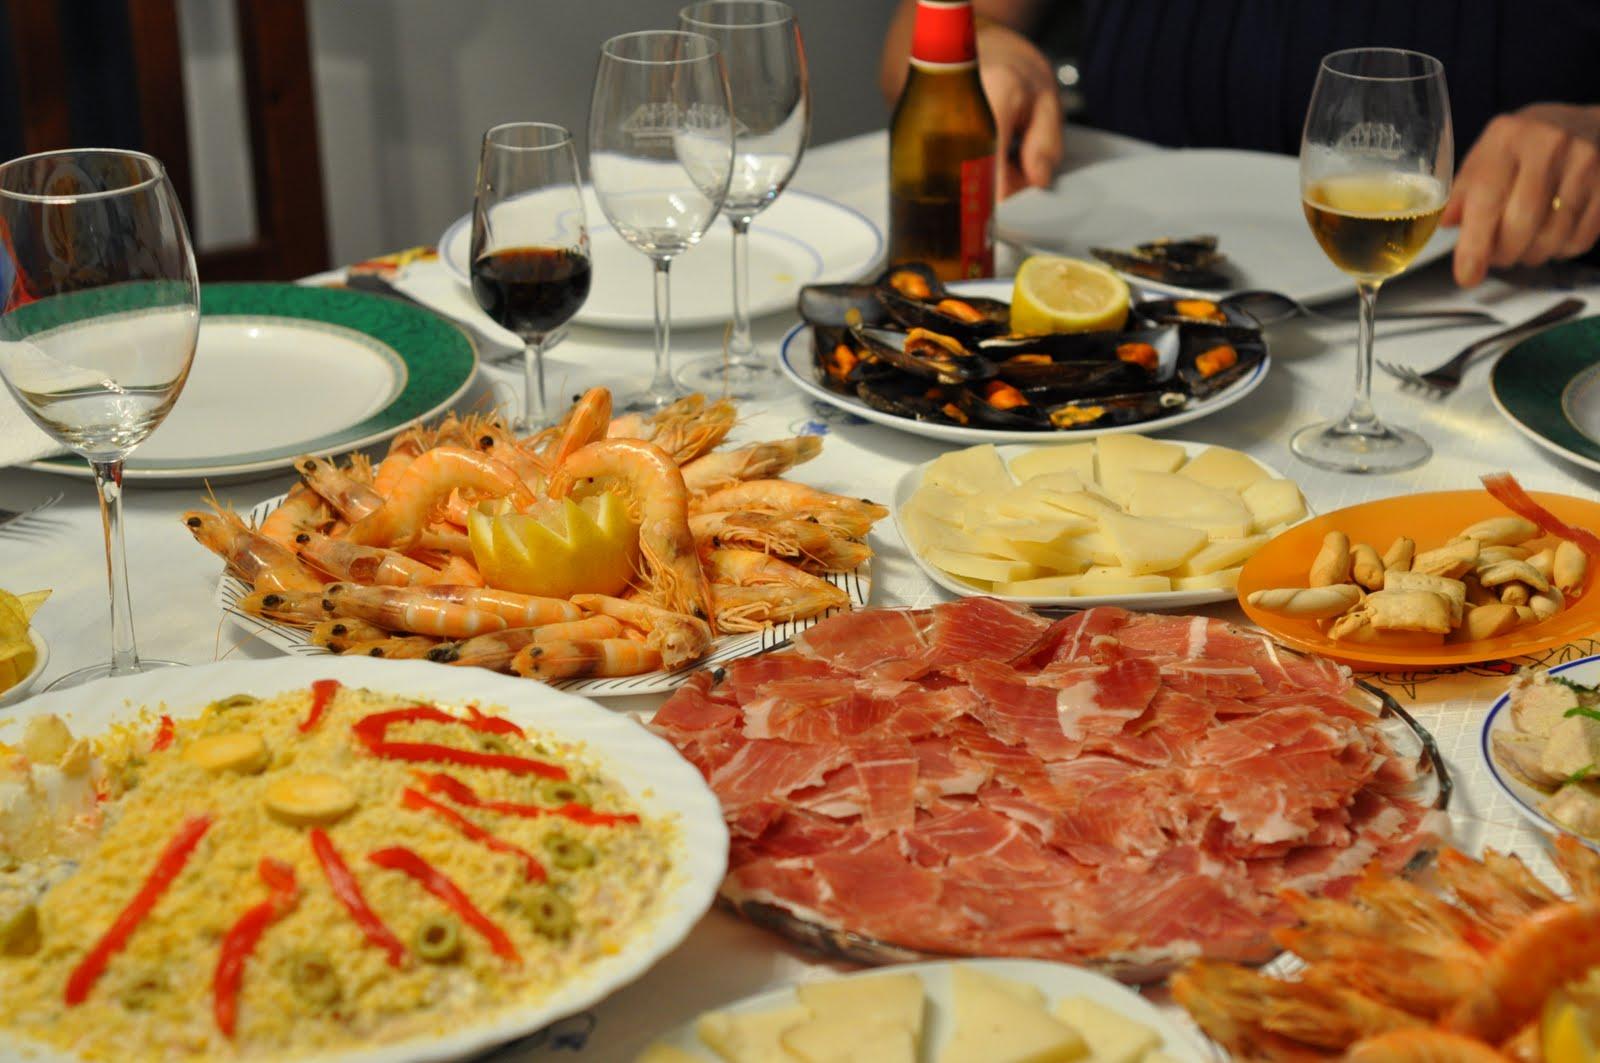 Mam s todoterreno 7 ideas para preparar una mesa especial for Comidas para nochevieja